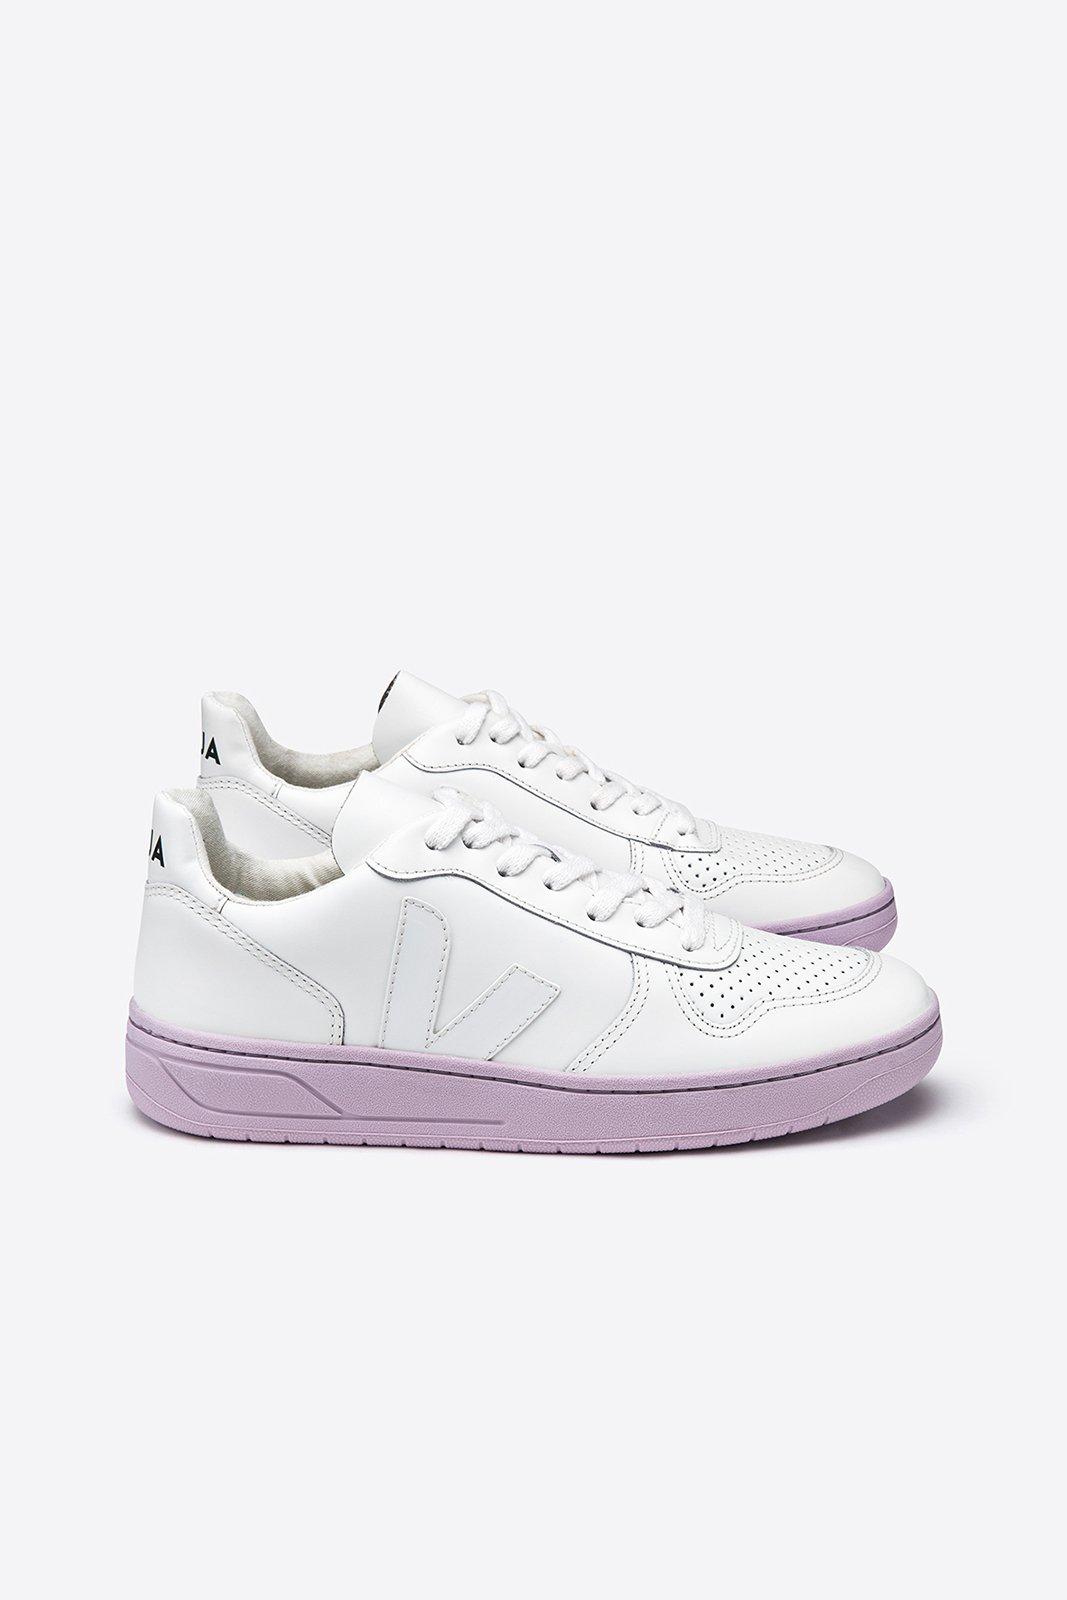 UNISEX VEJA V-10 Sole sneaker - Extra